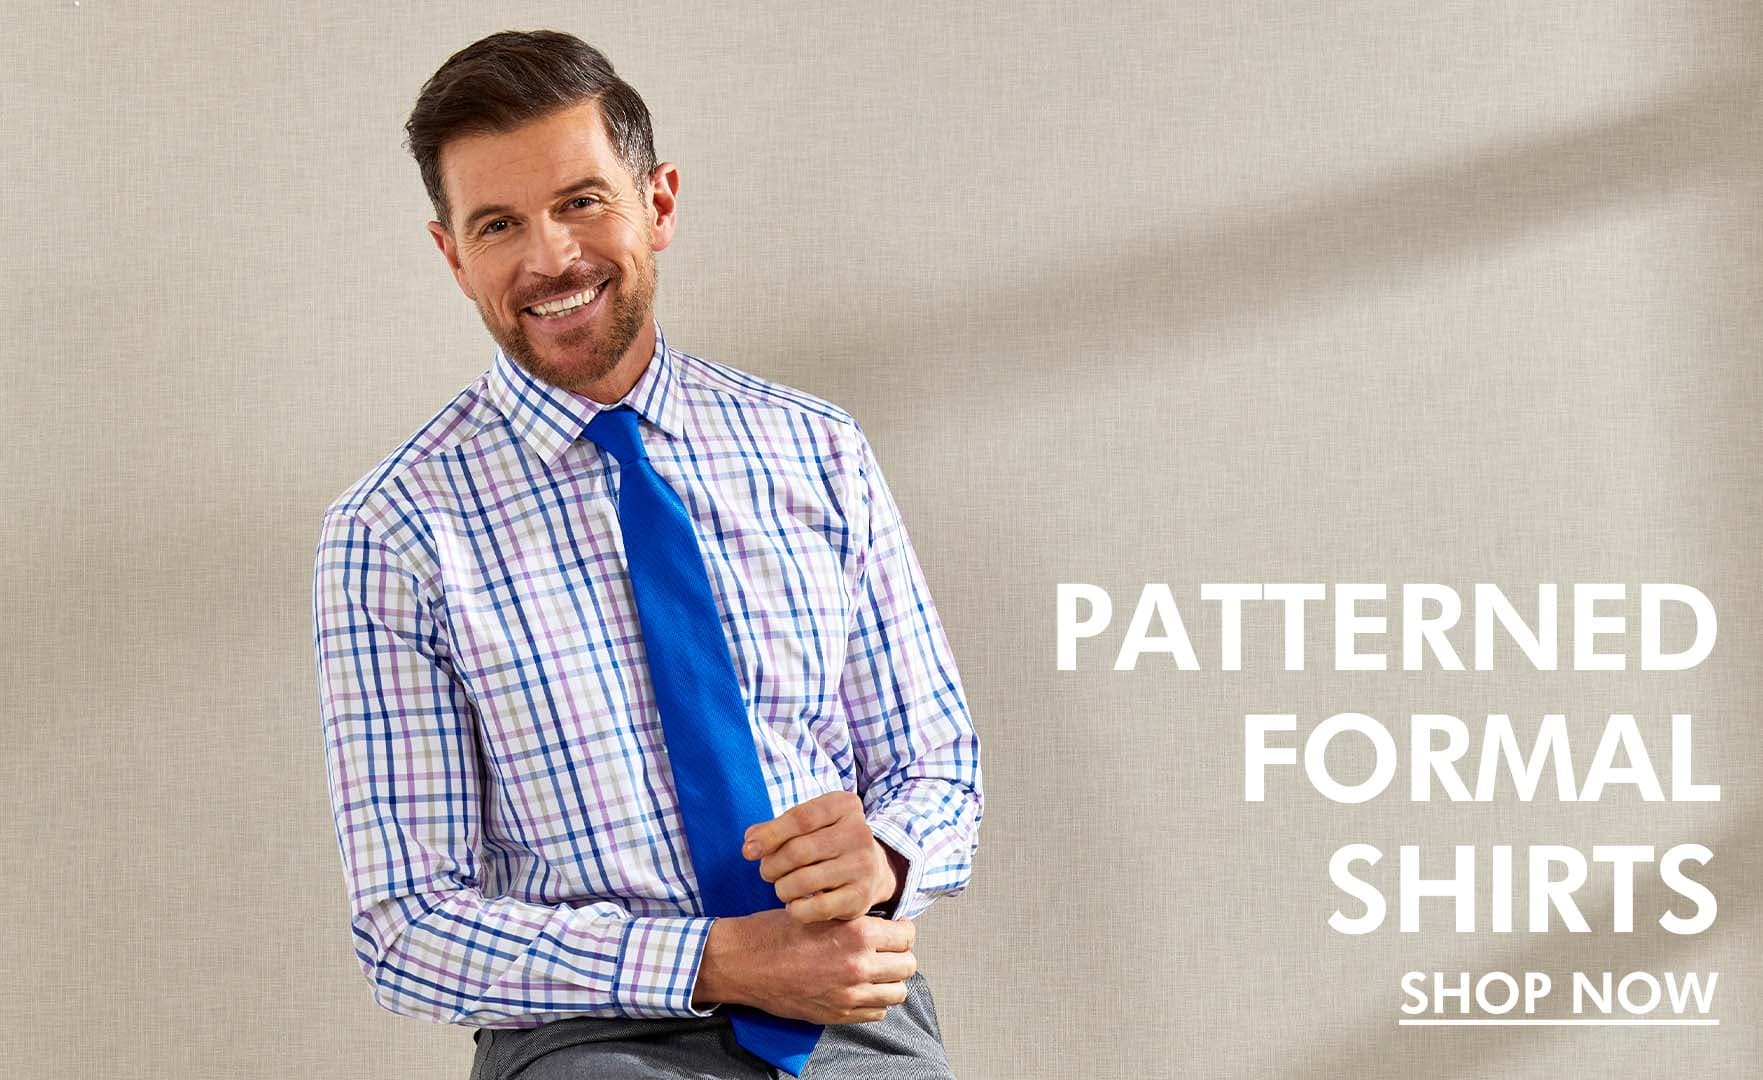 Patterned Formal Shirts New Season